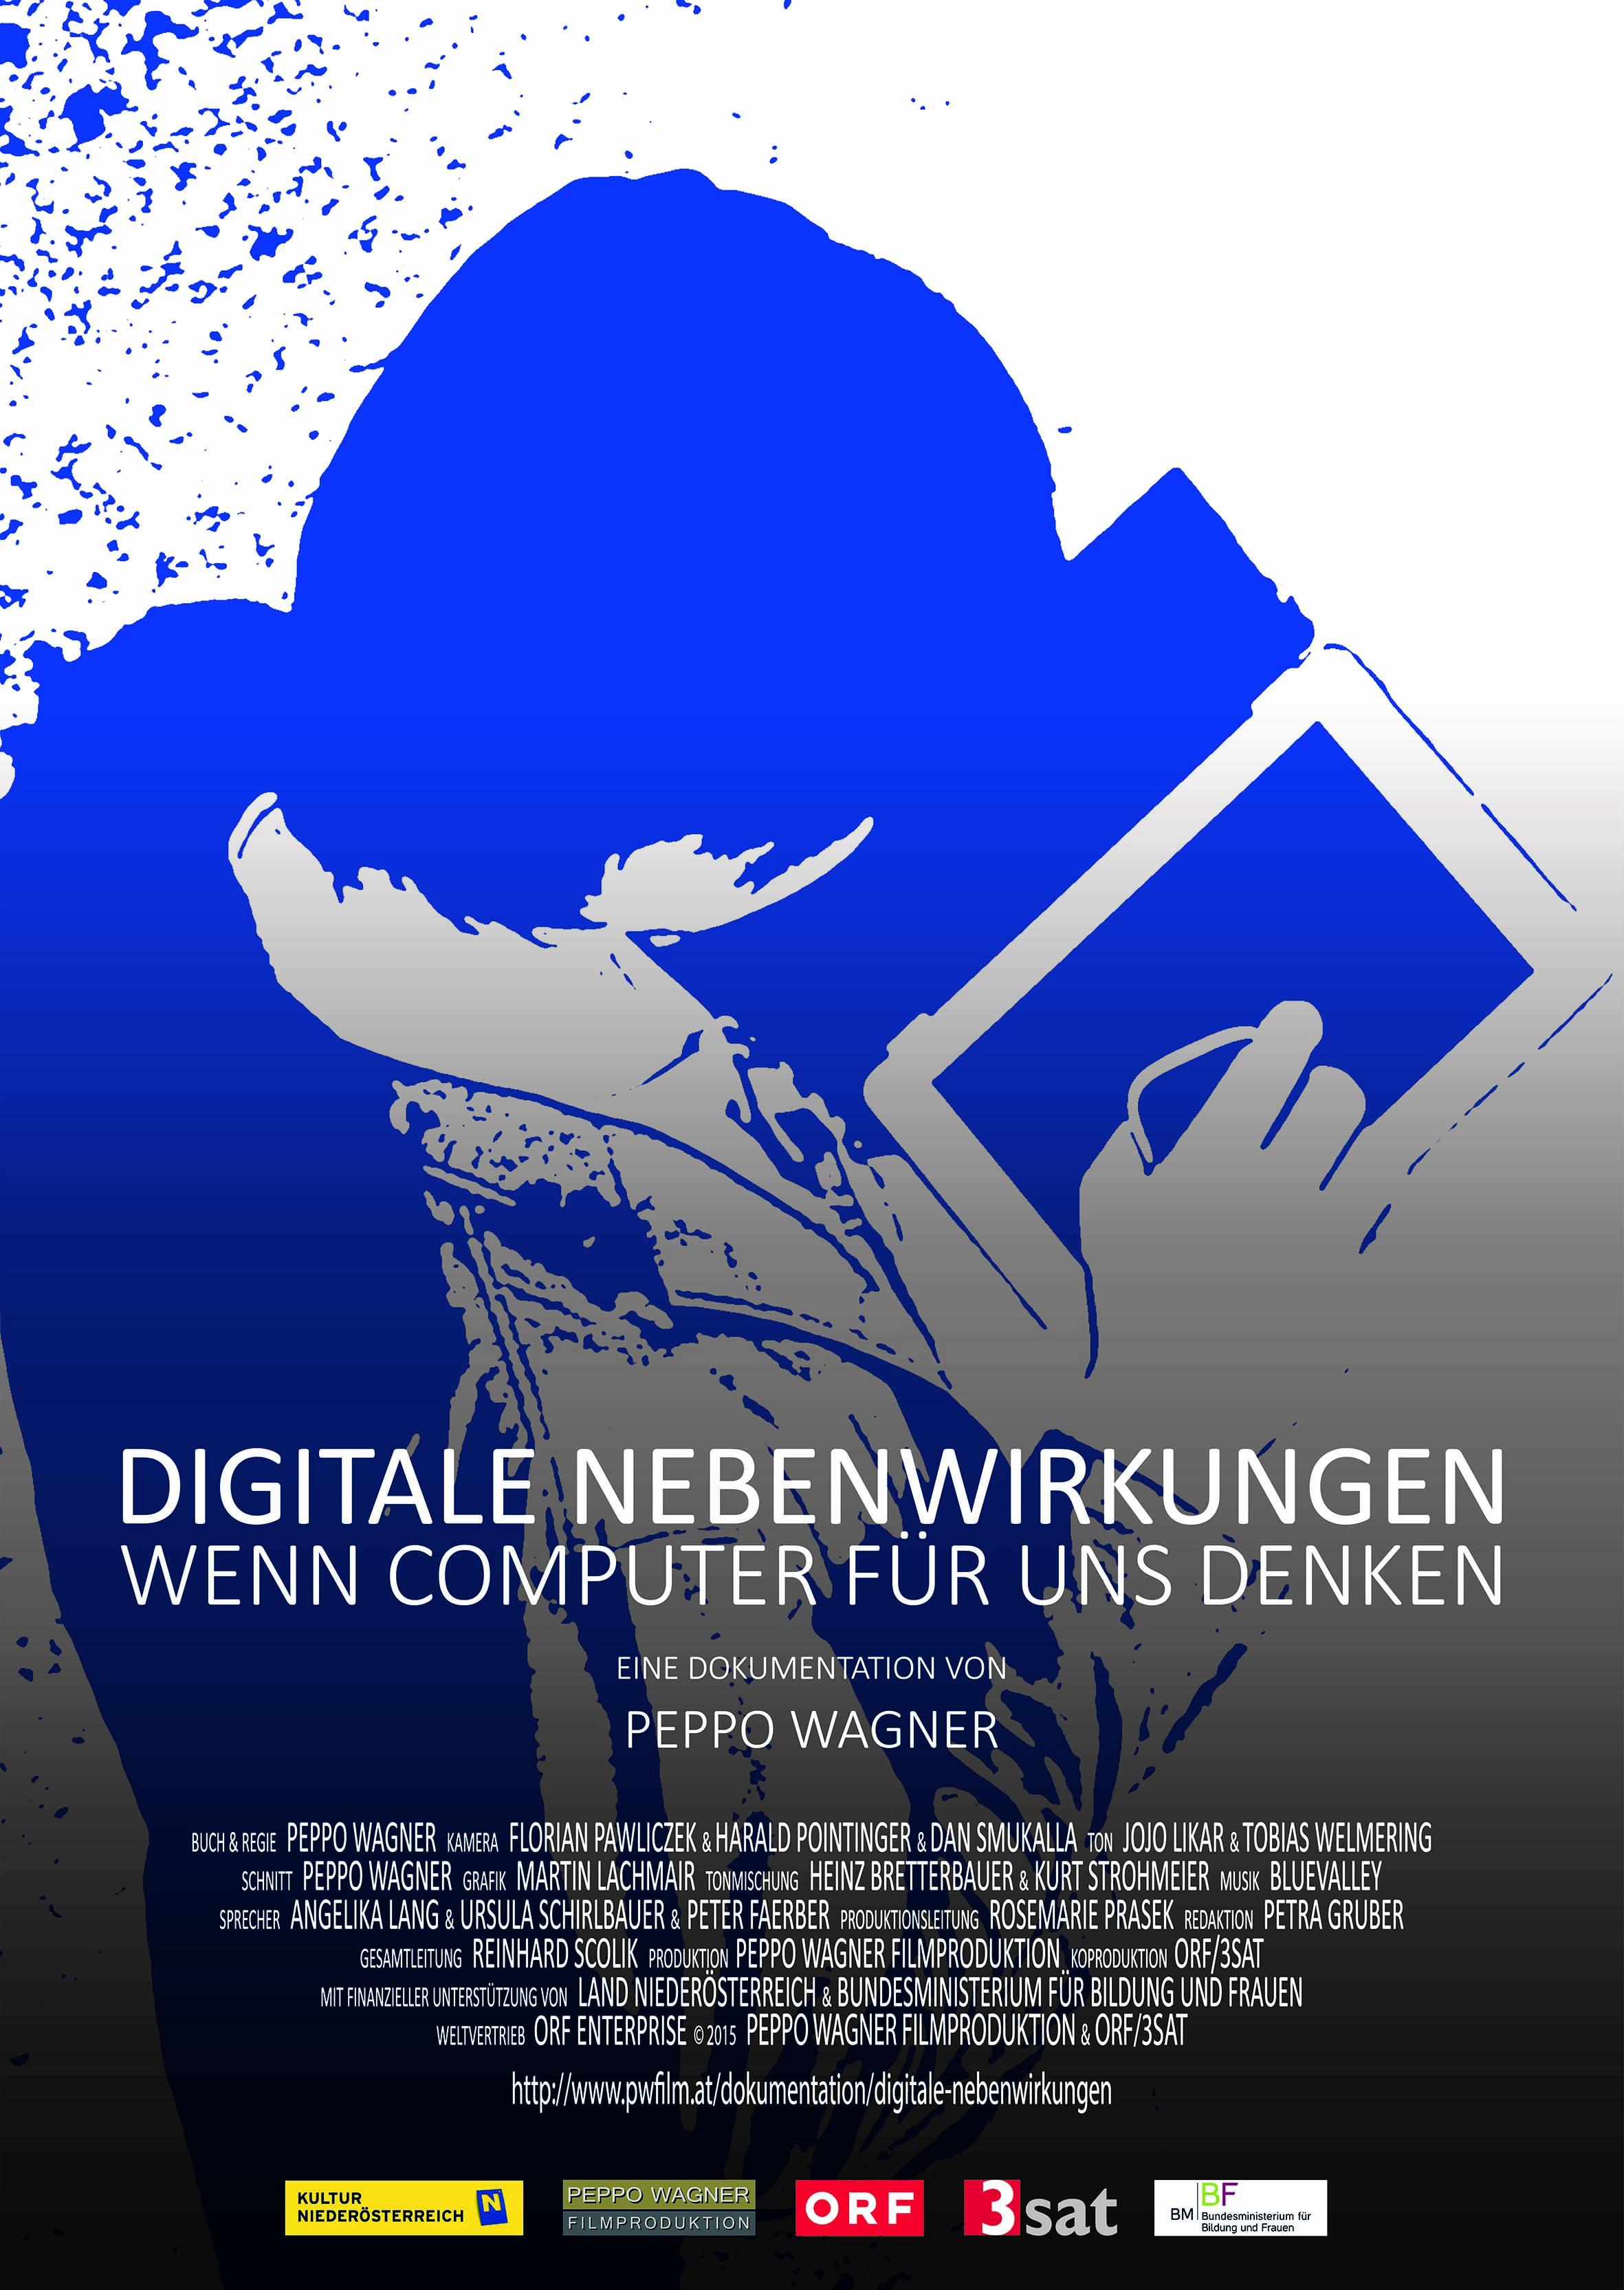 Digitale Nebenwirkungen Plakat A1 V01